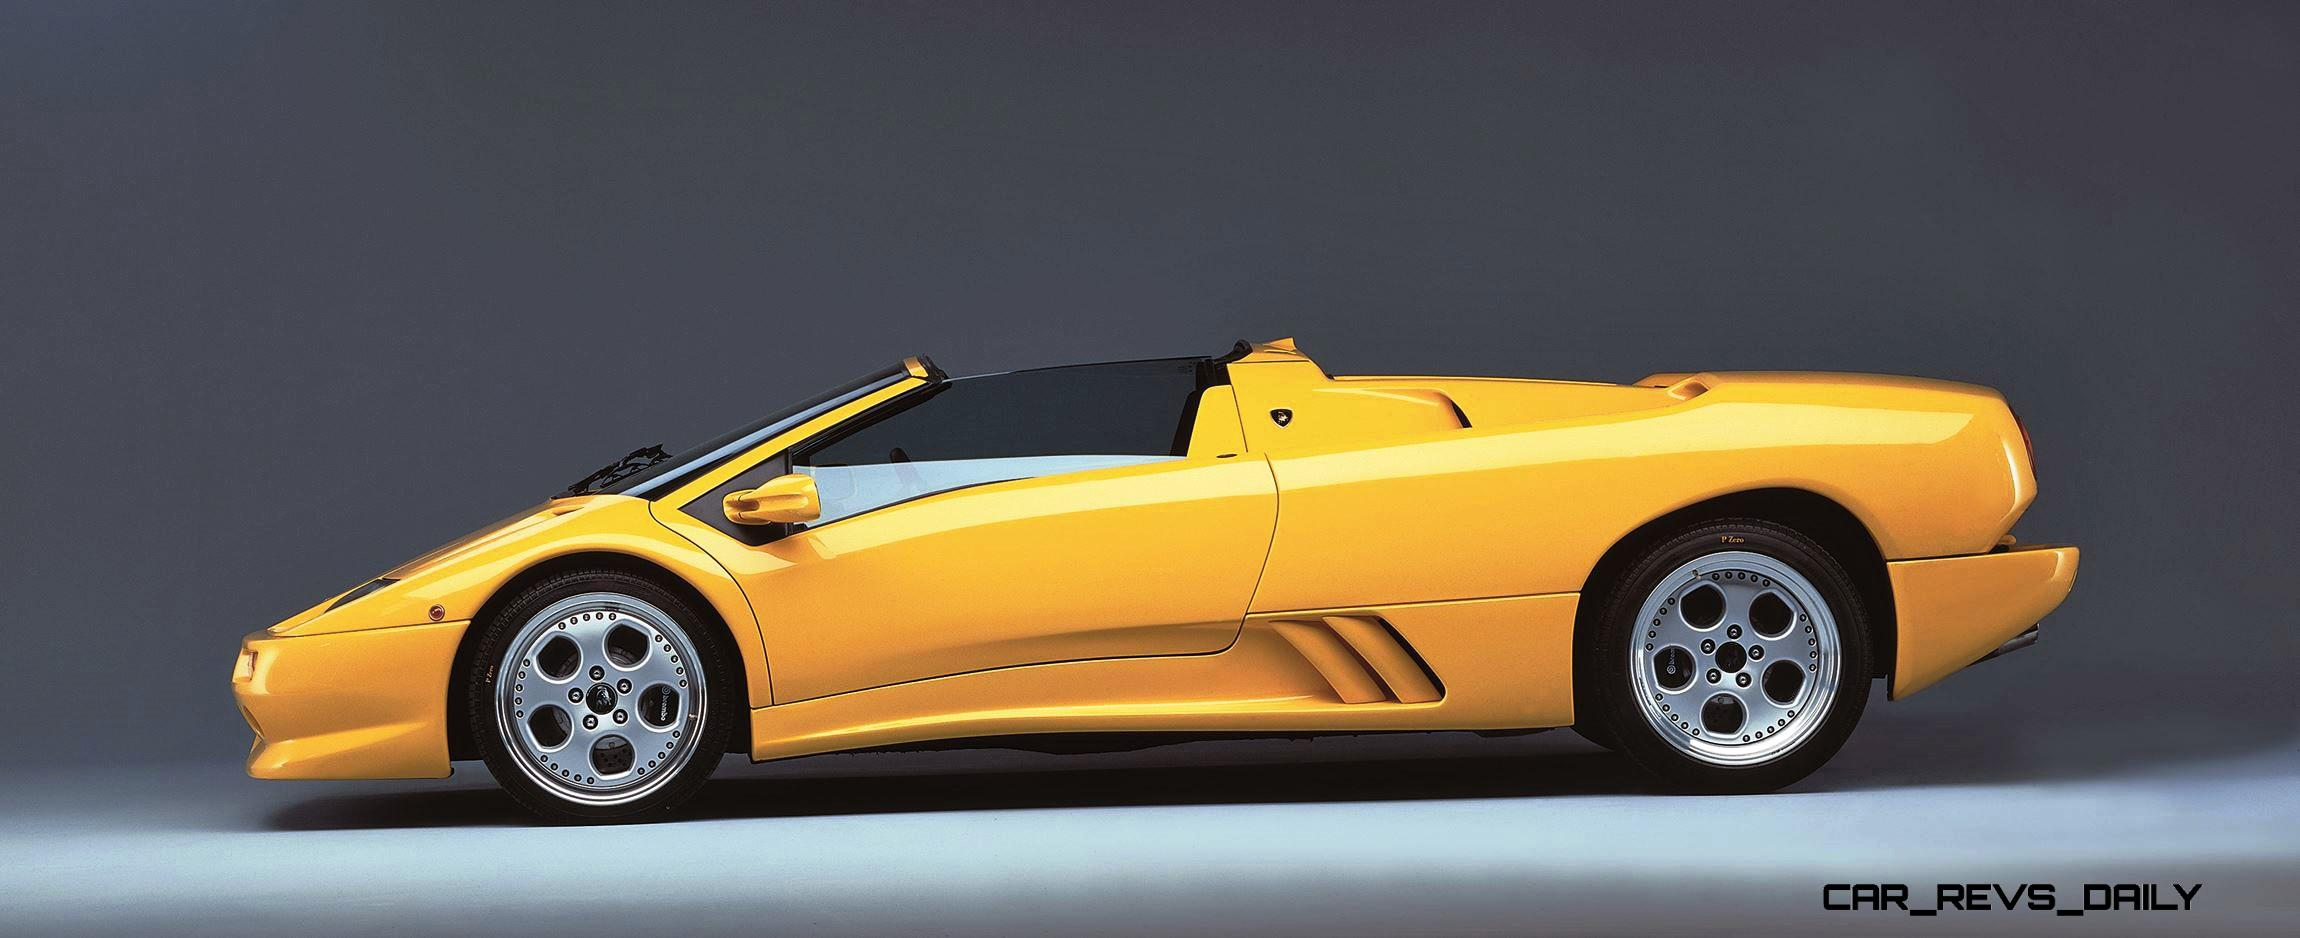 http://www.car-revs-daily.com/wp-content/uploads/1996-Lamborghini-Diablo-Roadster-6.jpg